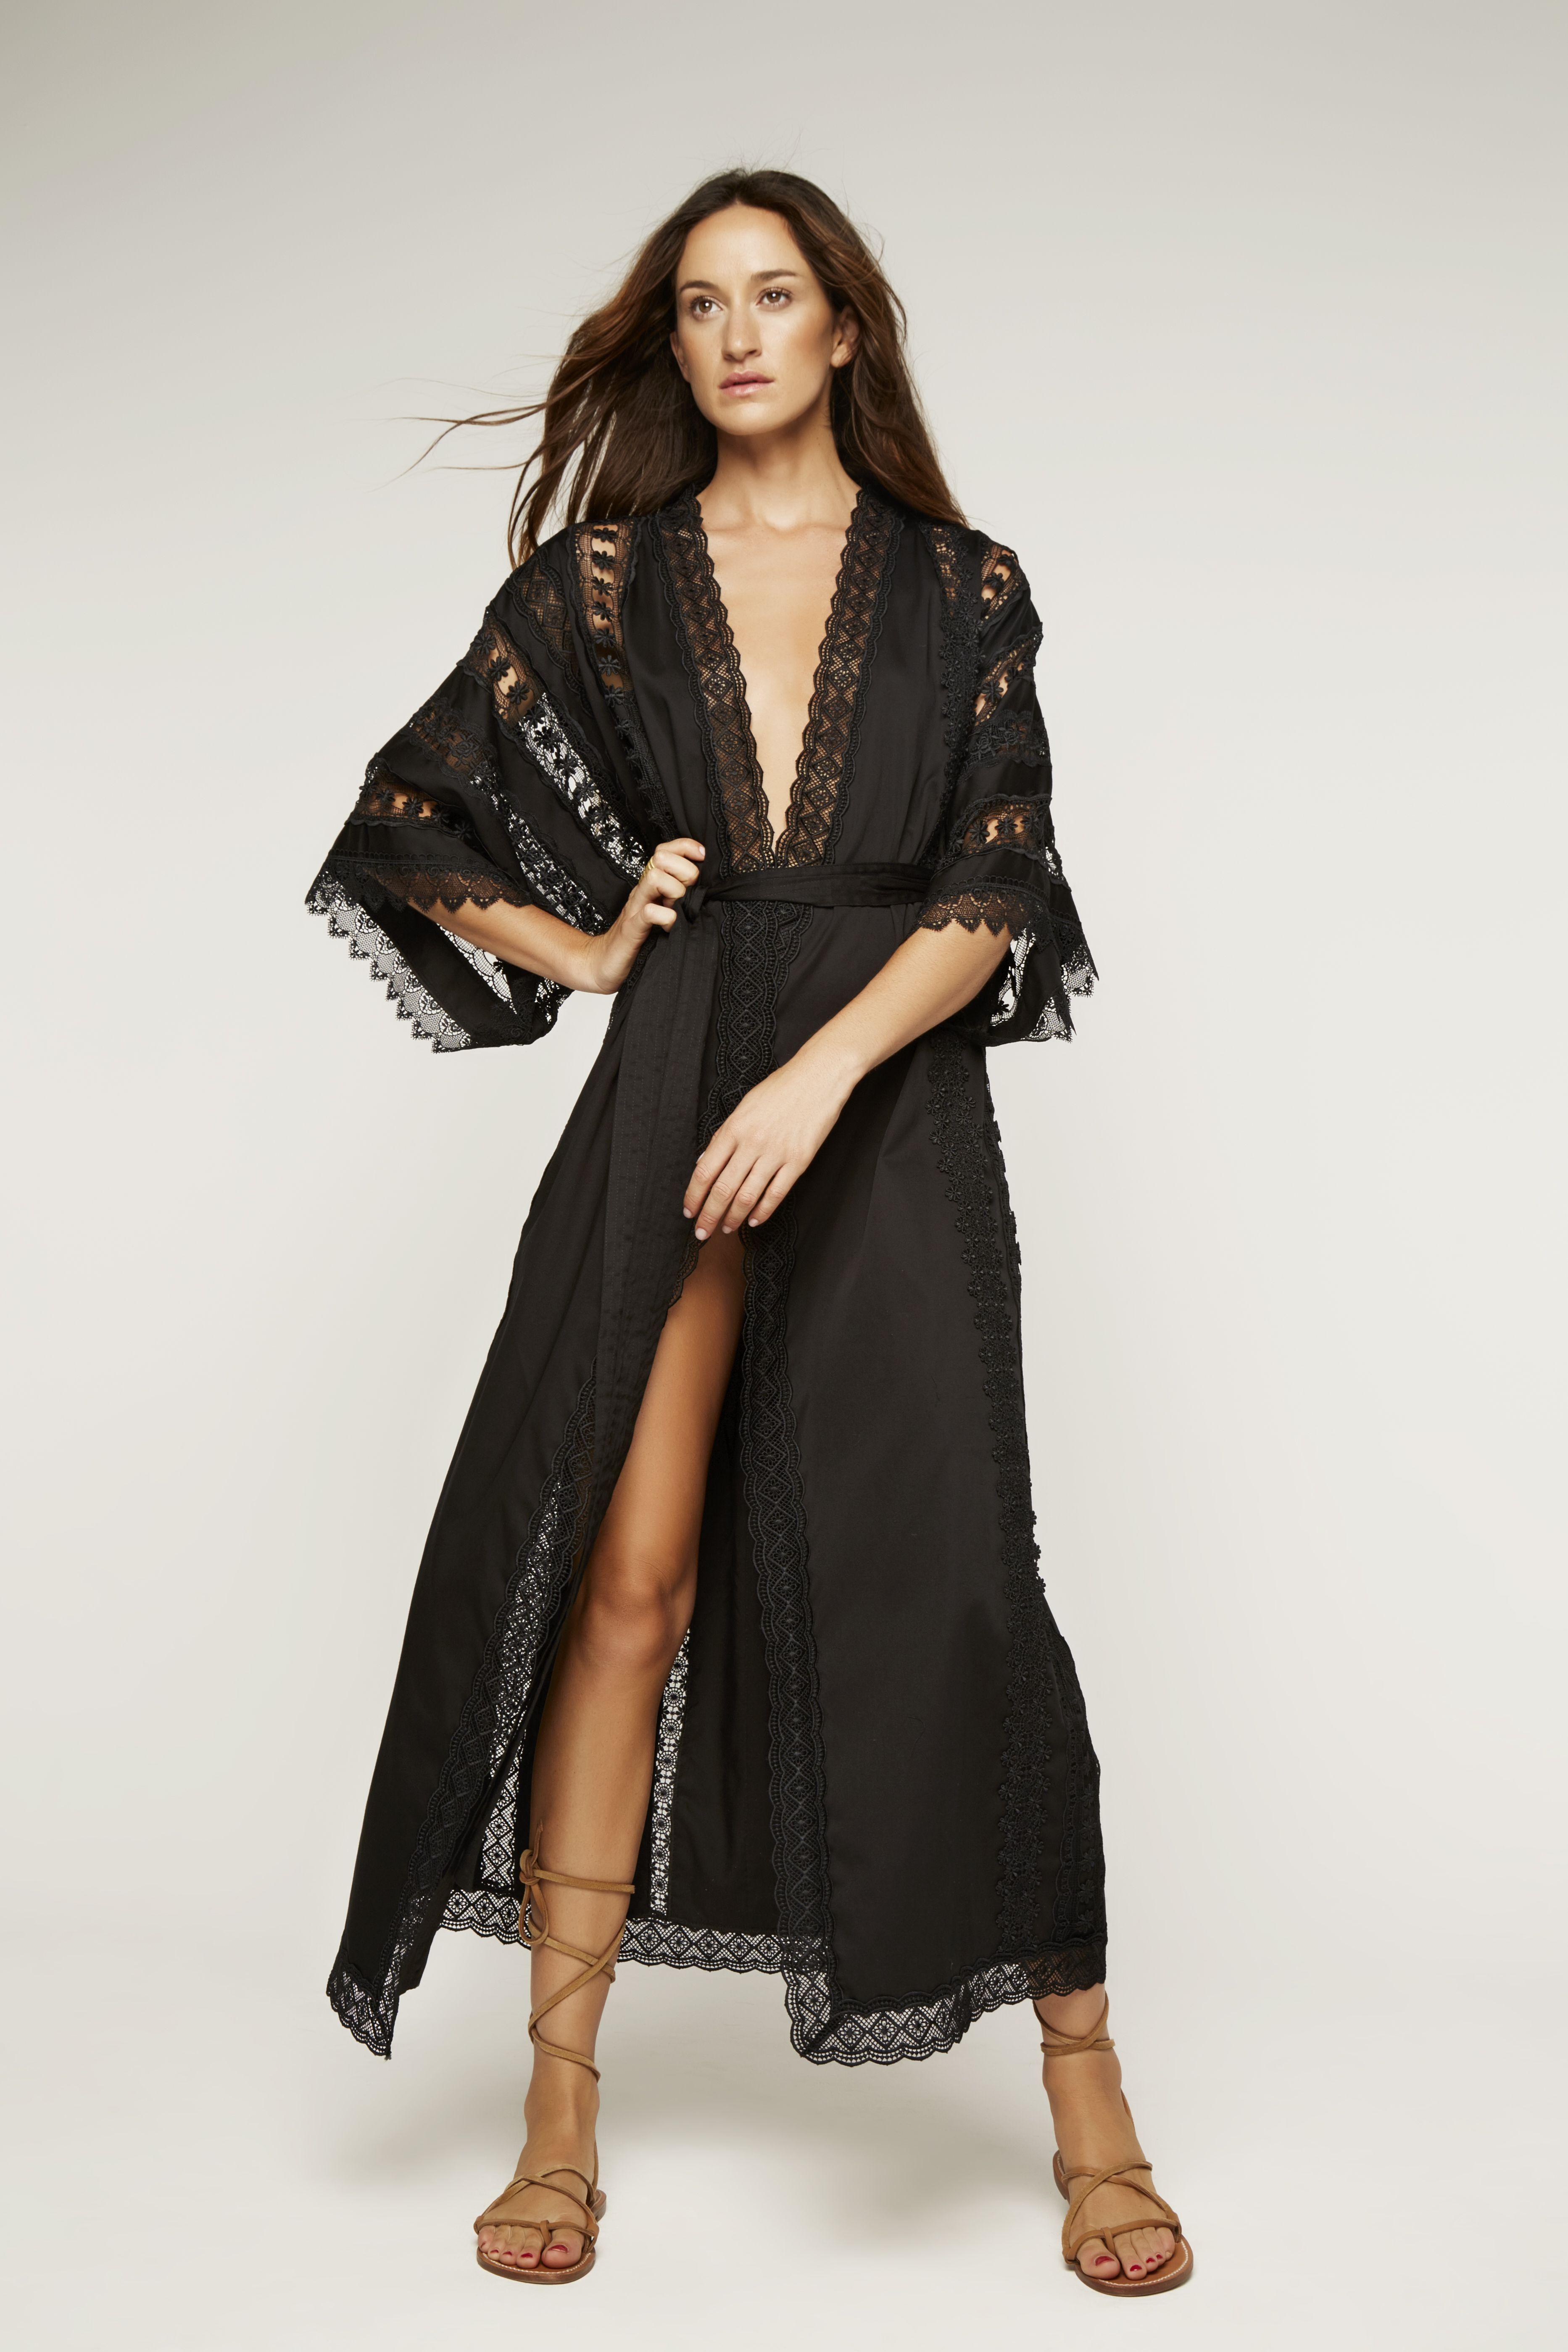 new Adlib - Kimono Aquila #charoruizibiza #adlib #ibizastyle #charoruiz #modaibicenca #ibiza | Ibiza fashion. Fashion. Outfits